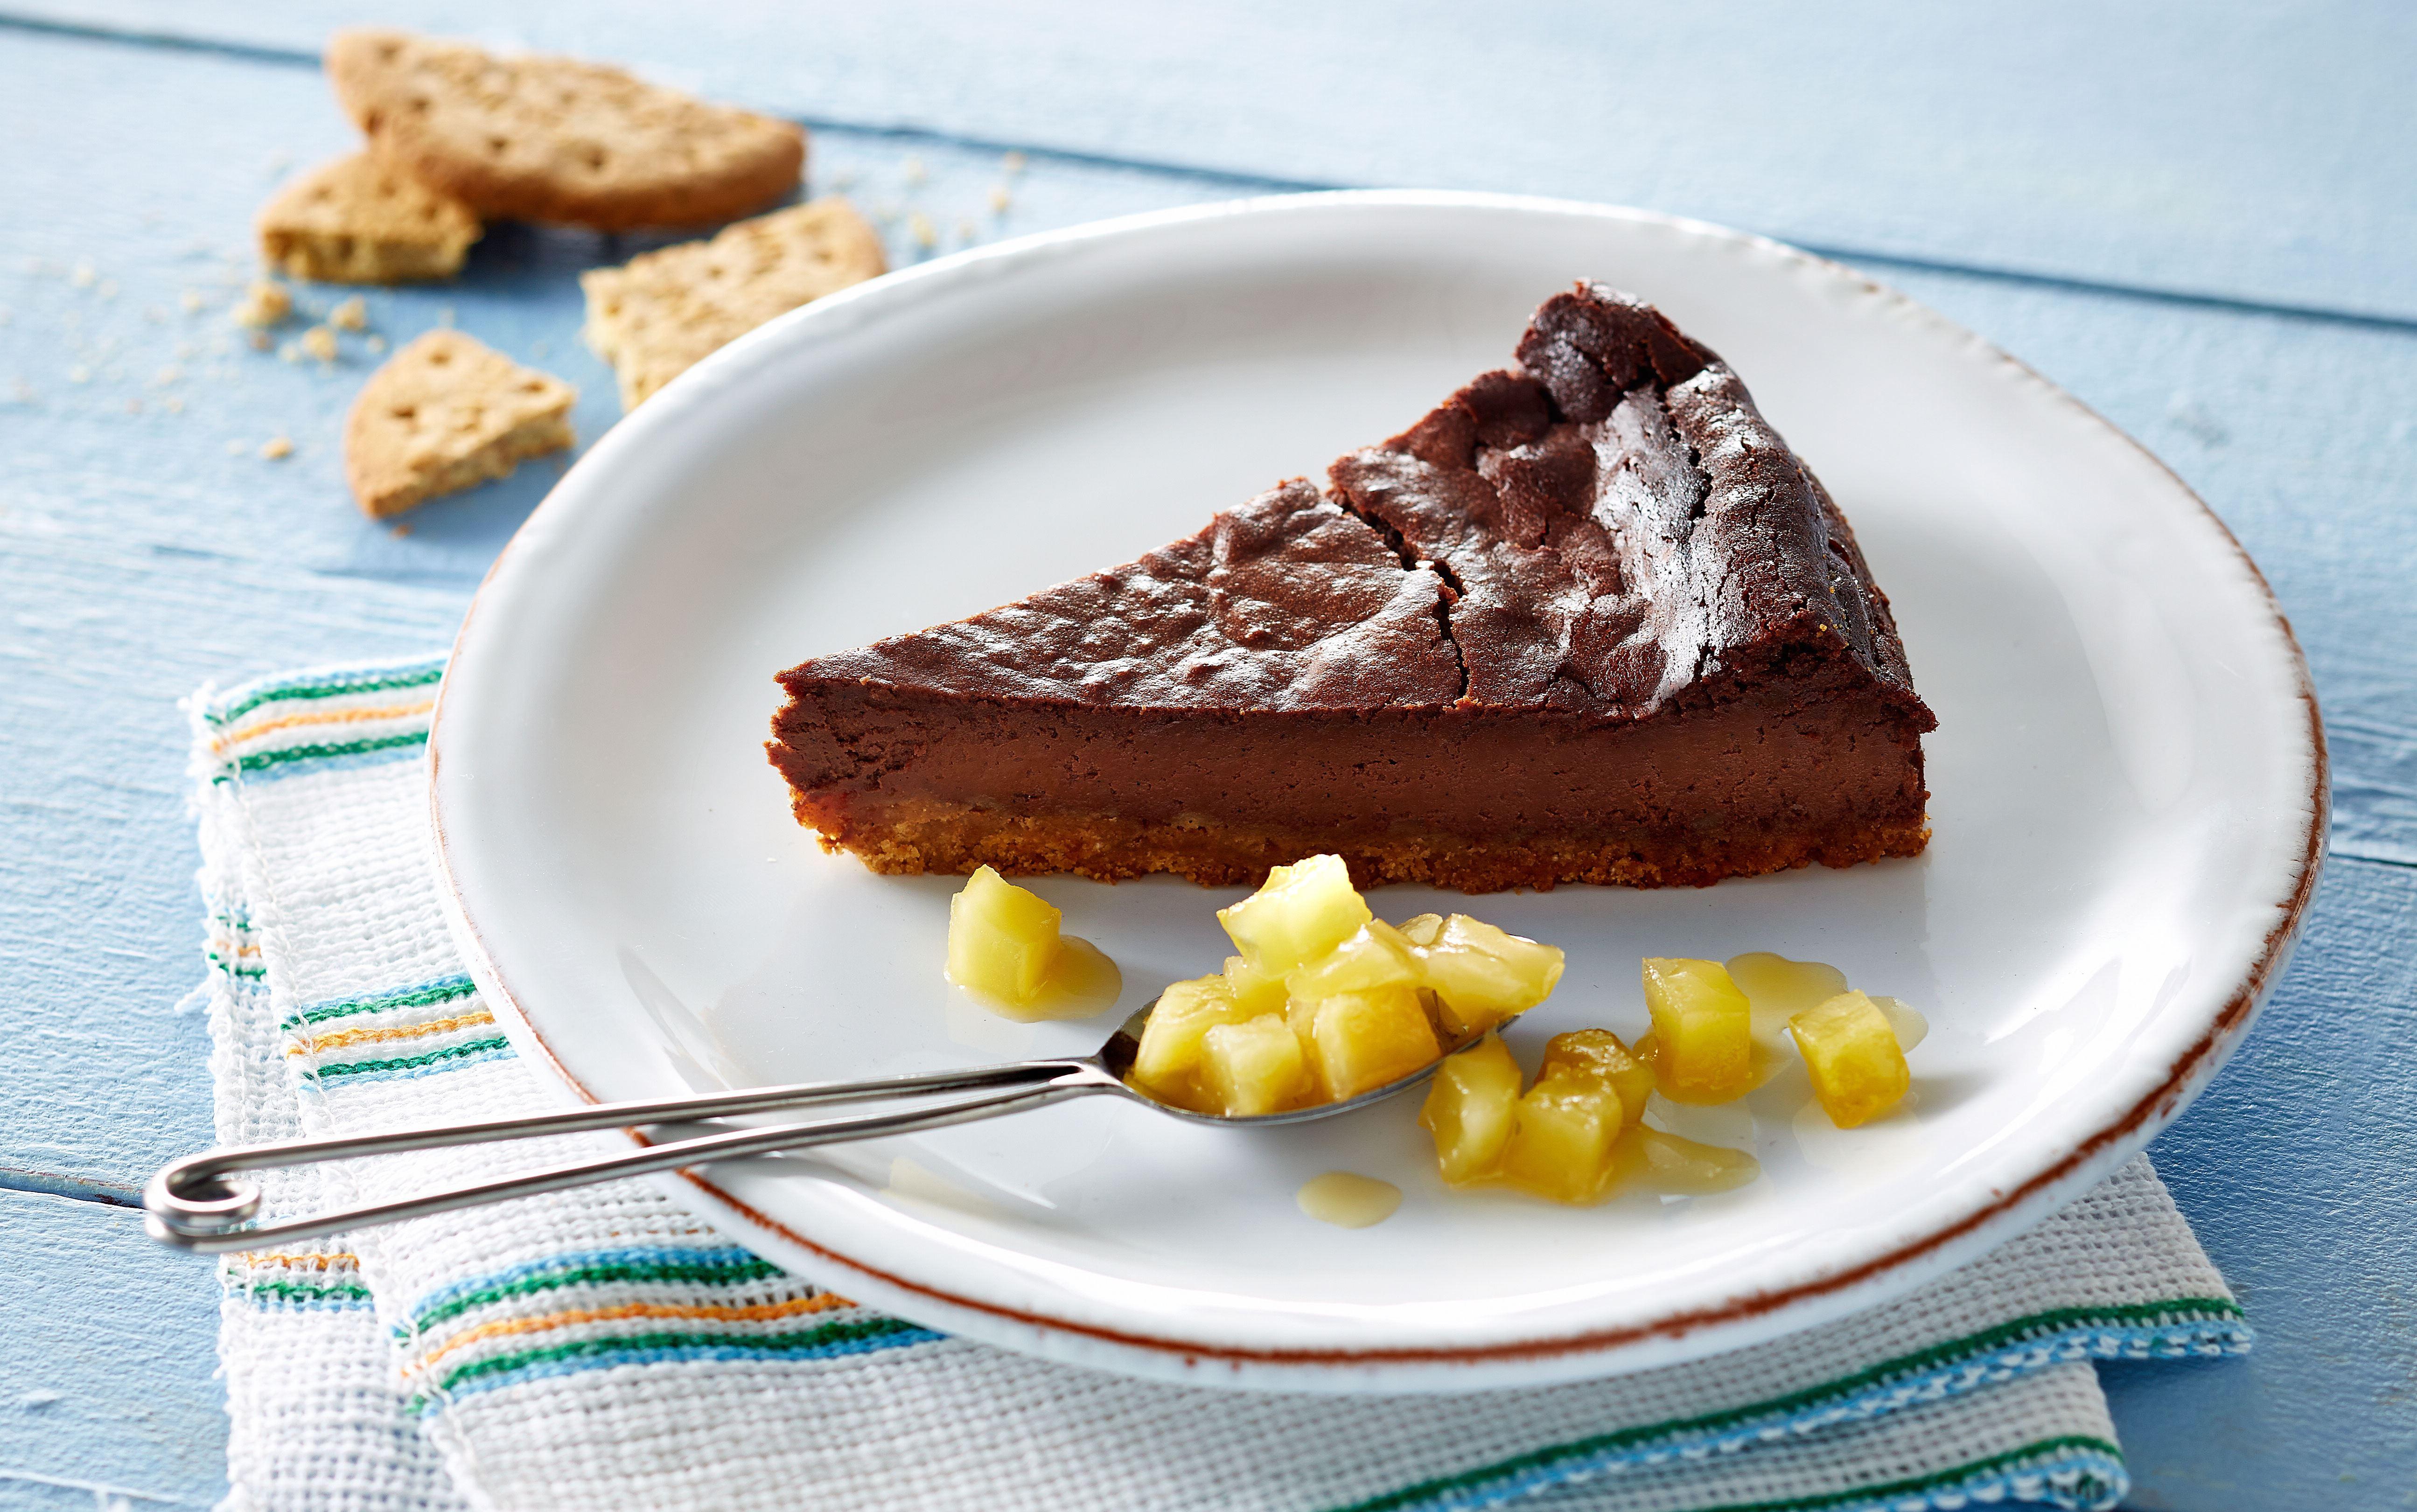 Chokoladekage med sprød bund